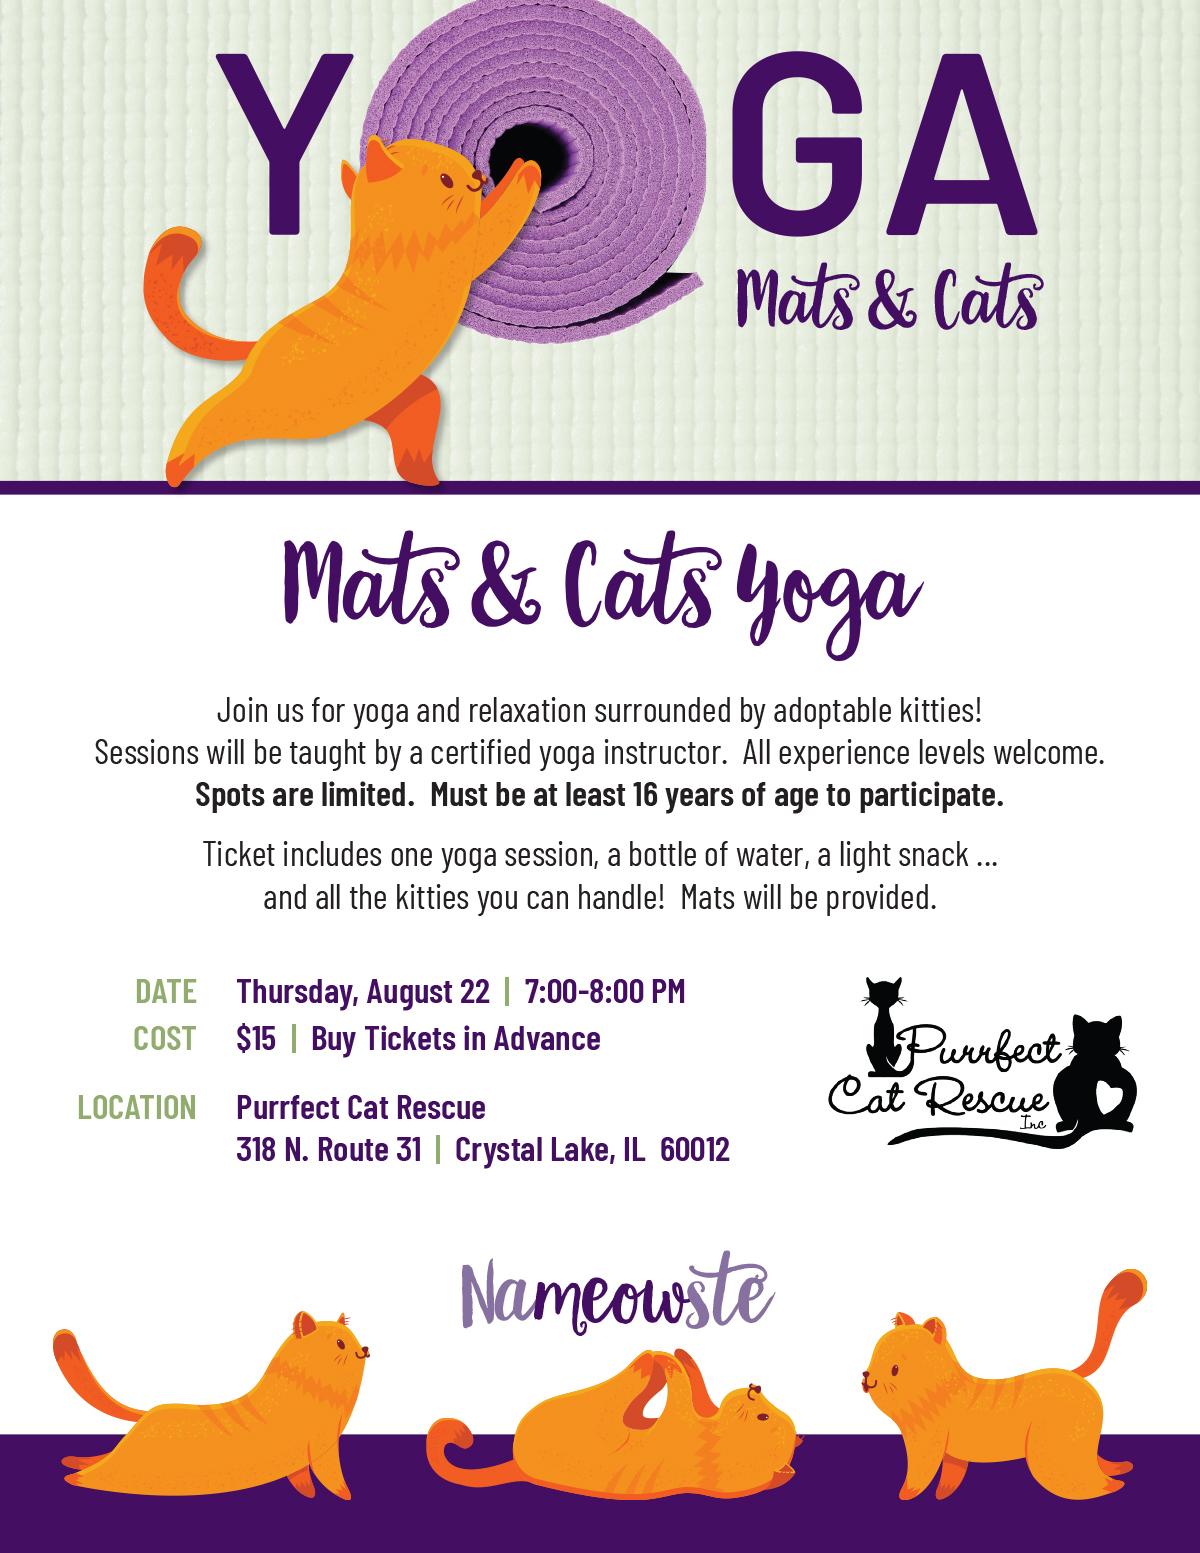 mats_and_cats_yoga_flyer_082219_1200x1553.jpg